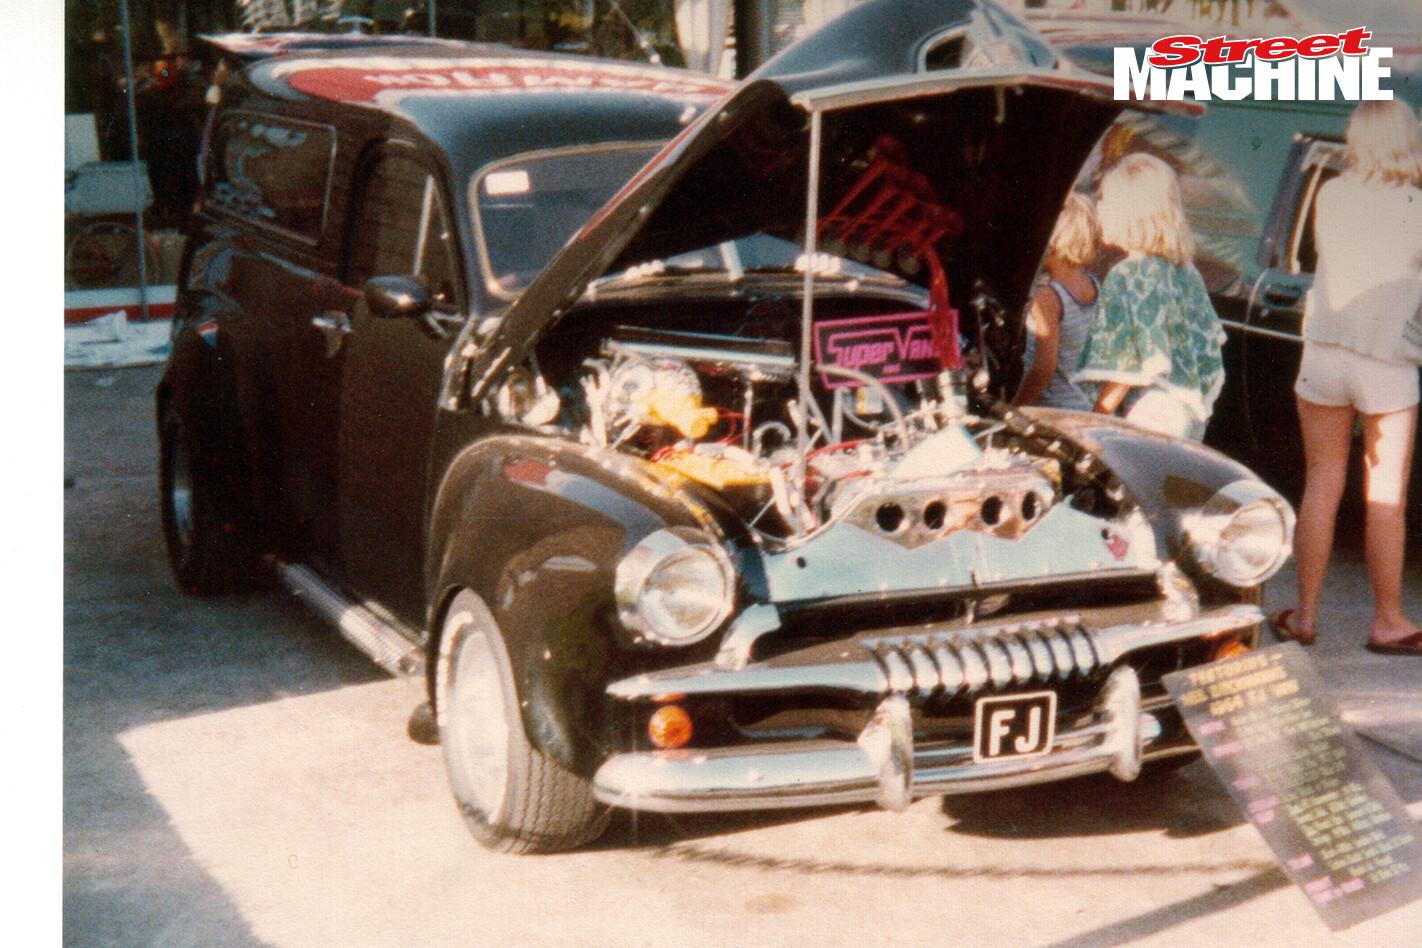 Neil Dieckmann's FJ Holden panel van